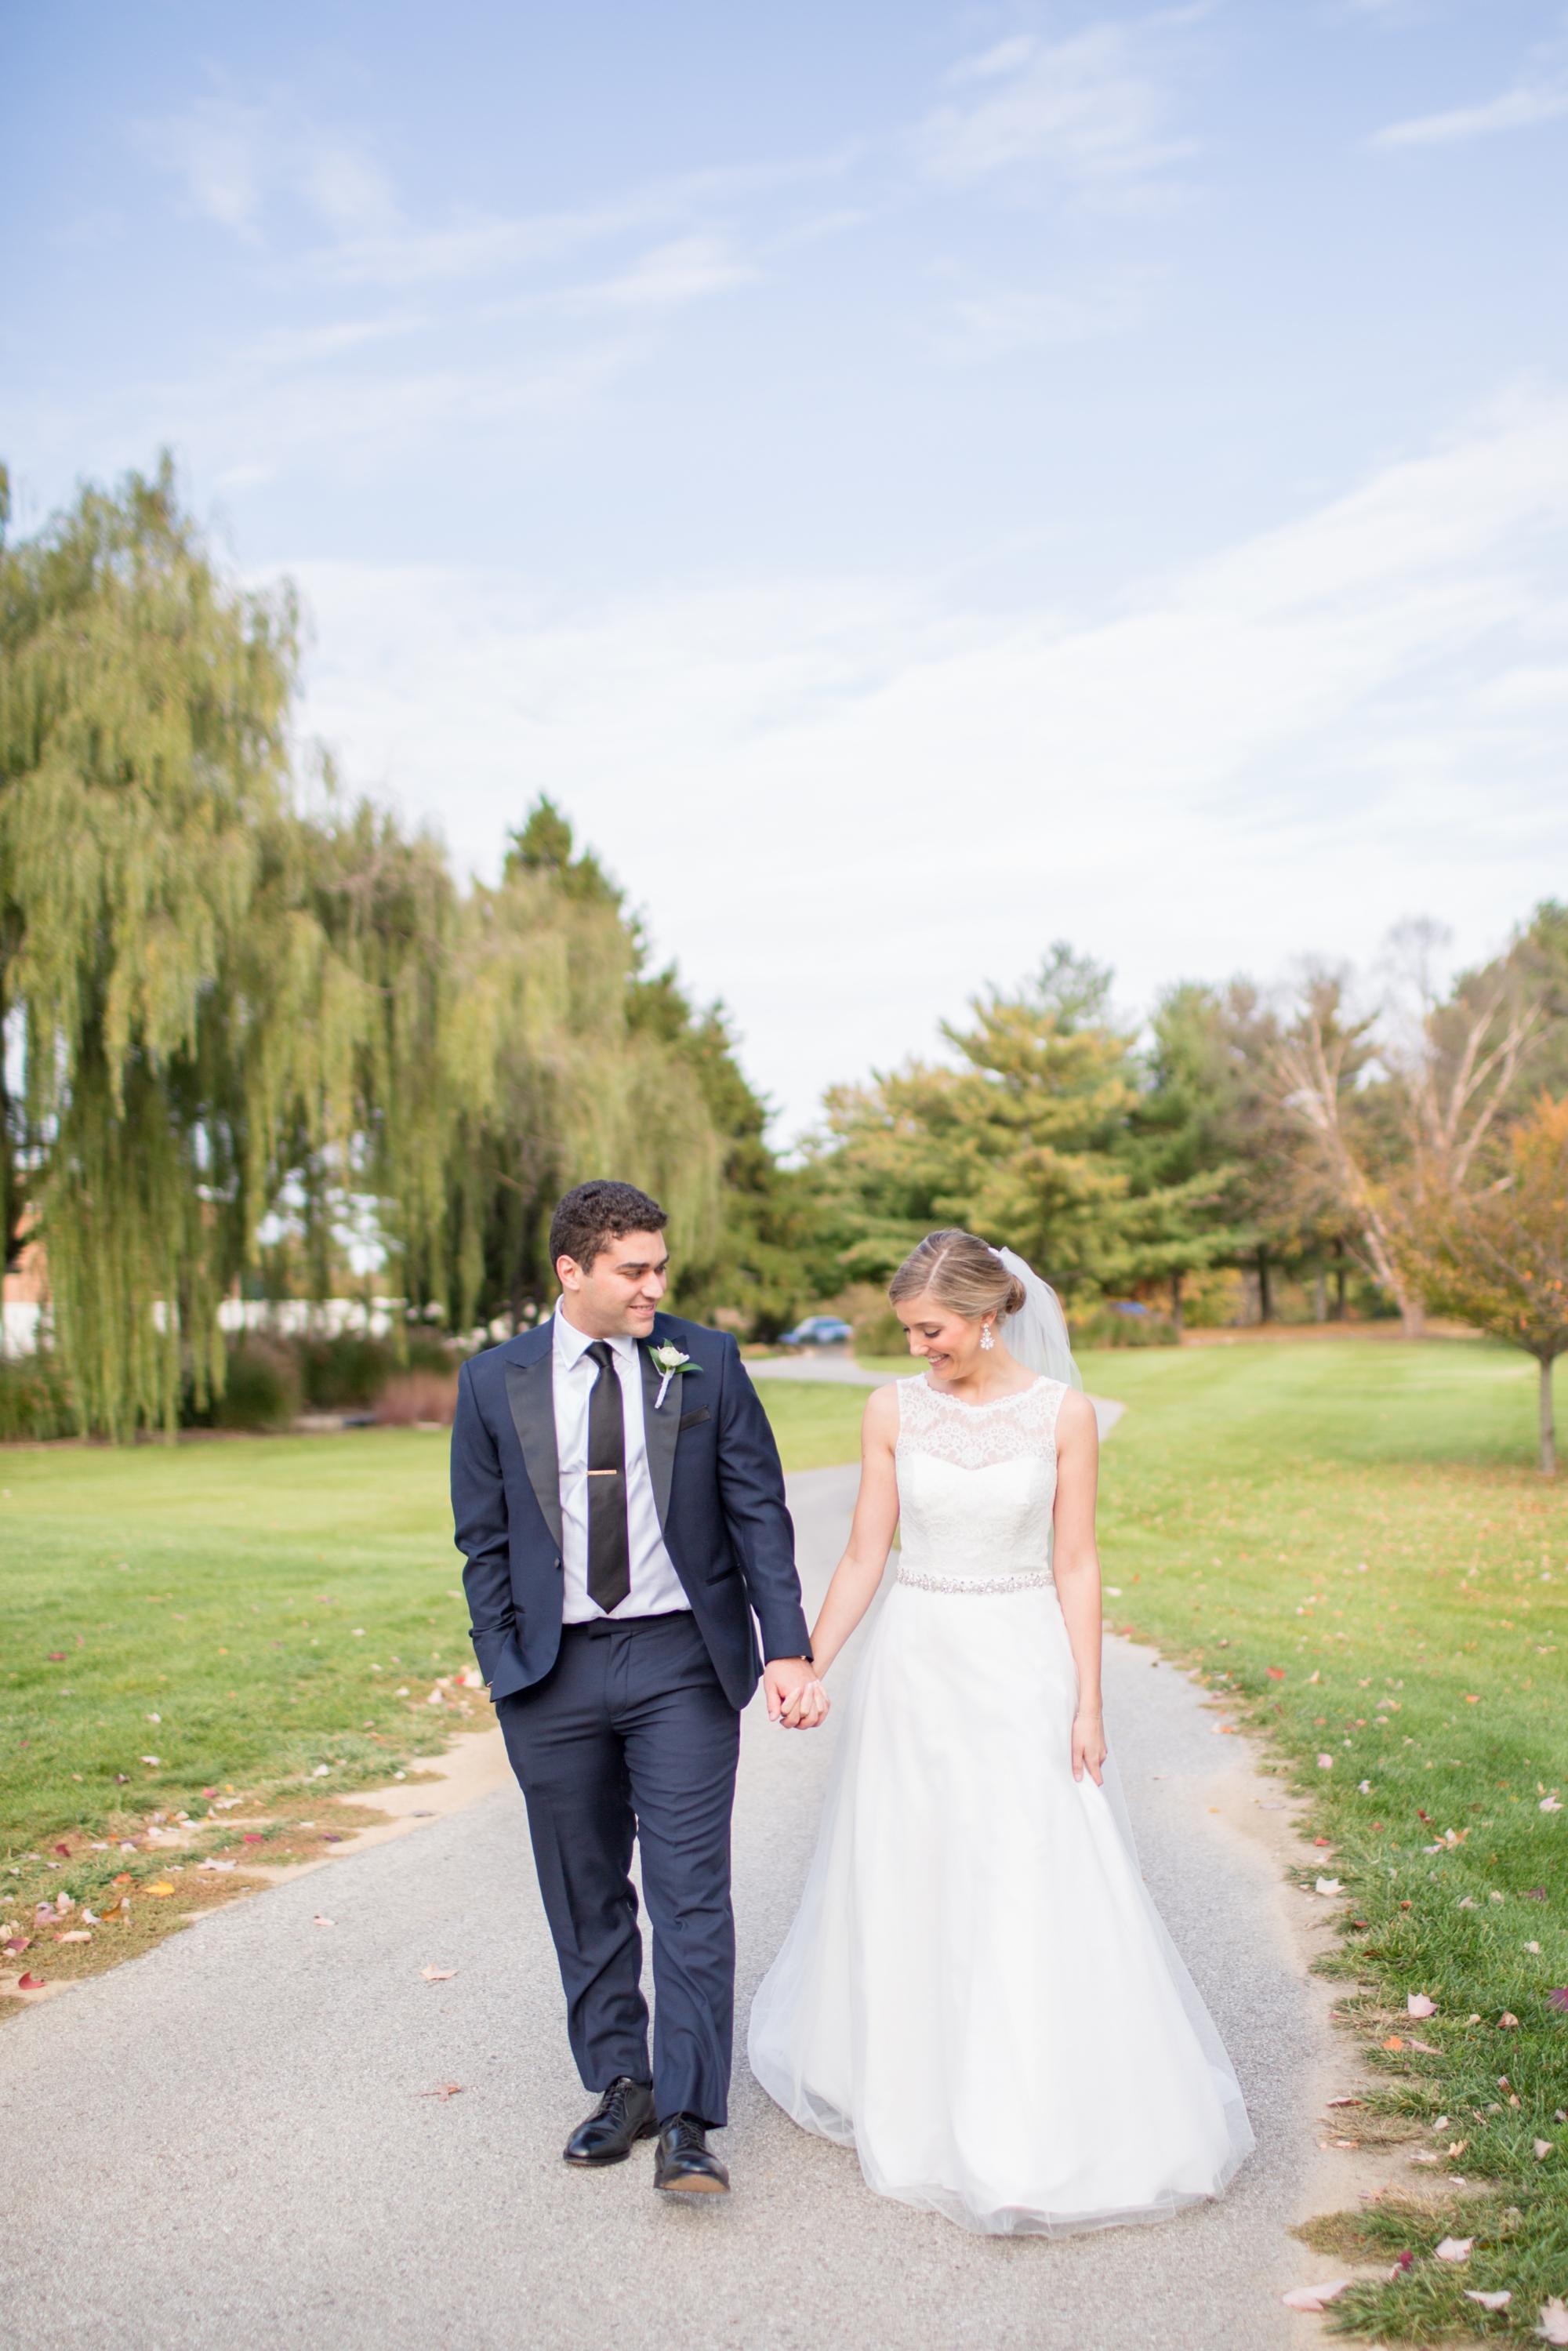 2-Finkel Wedding Bride & Groom Portraits-288_anna grace photography maryland wedding photographer turf valley.jpg